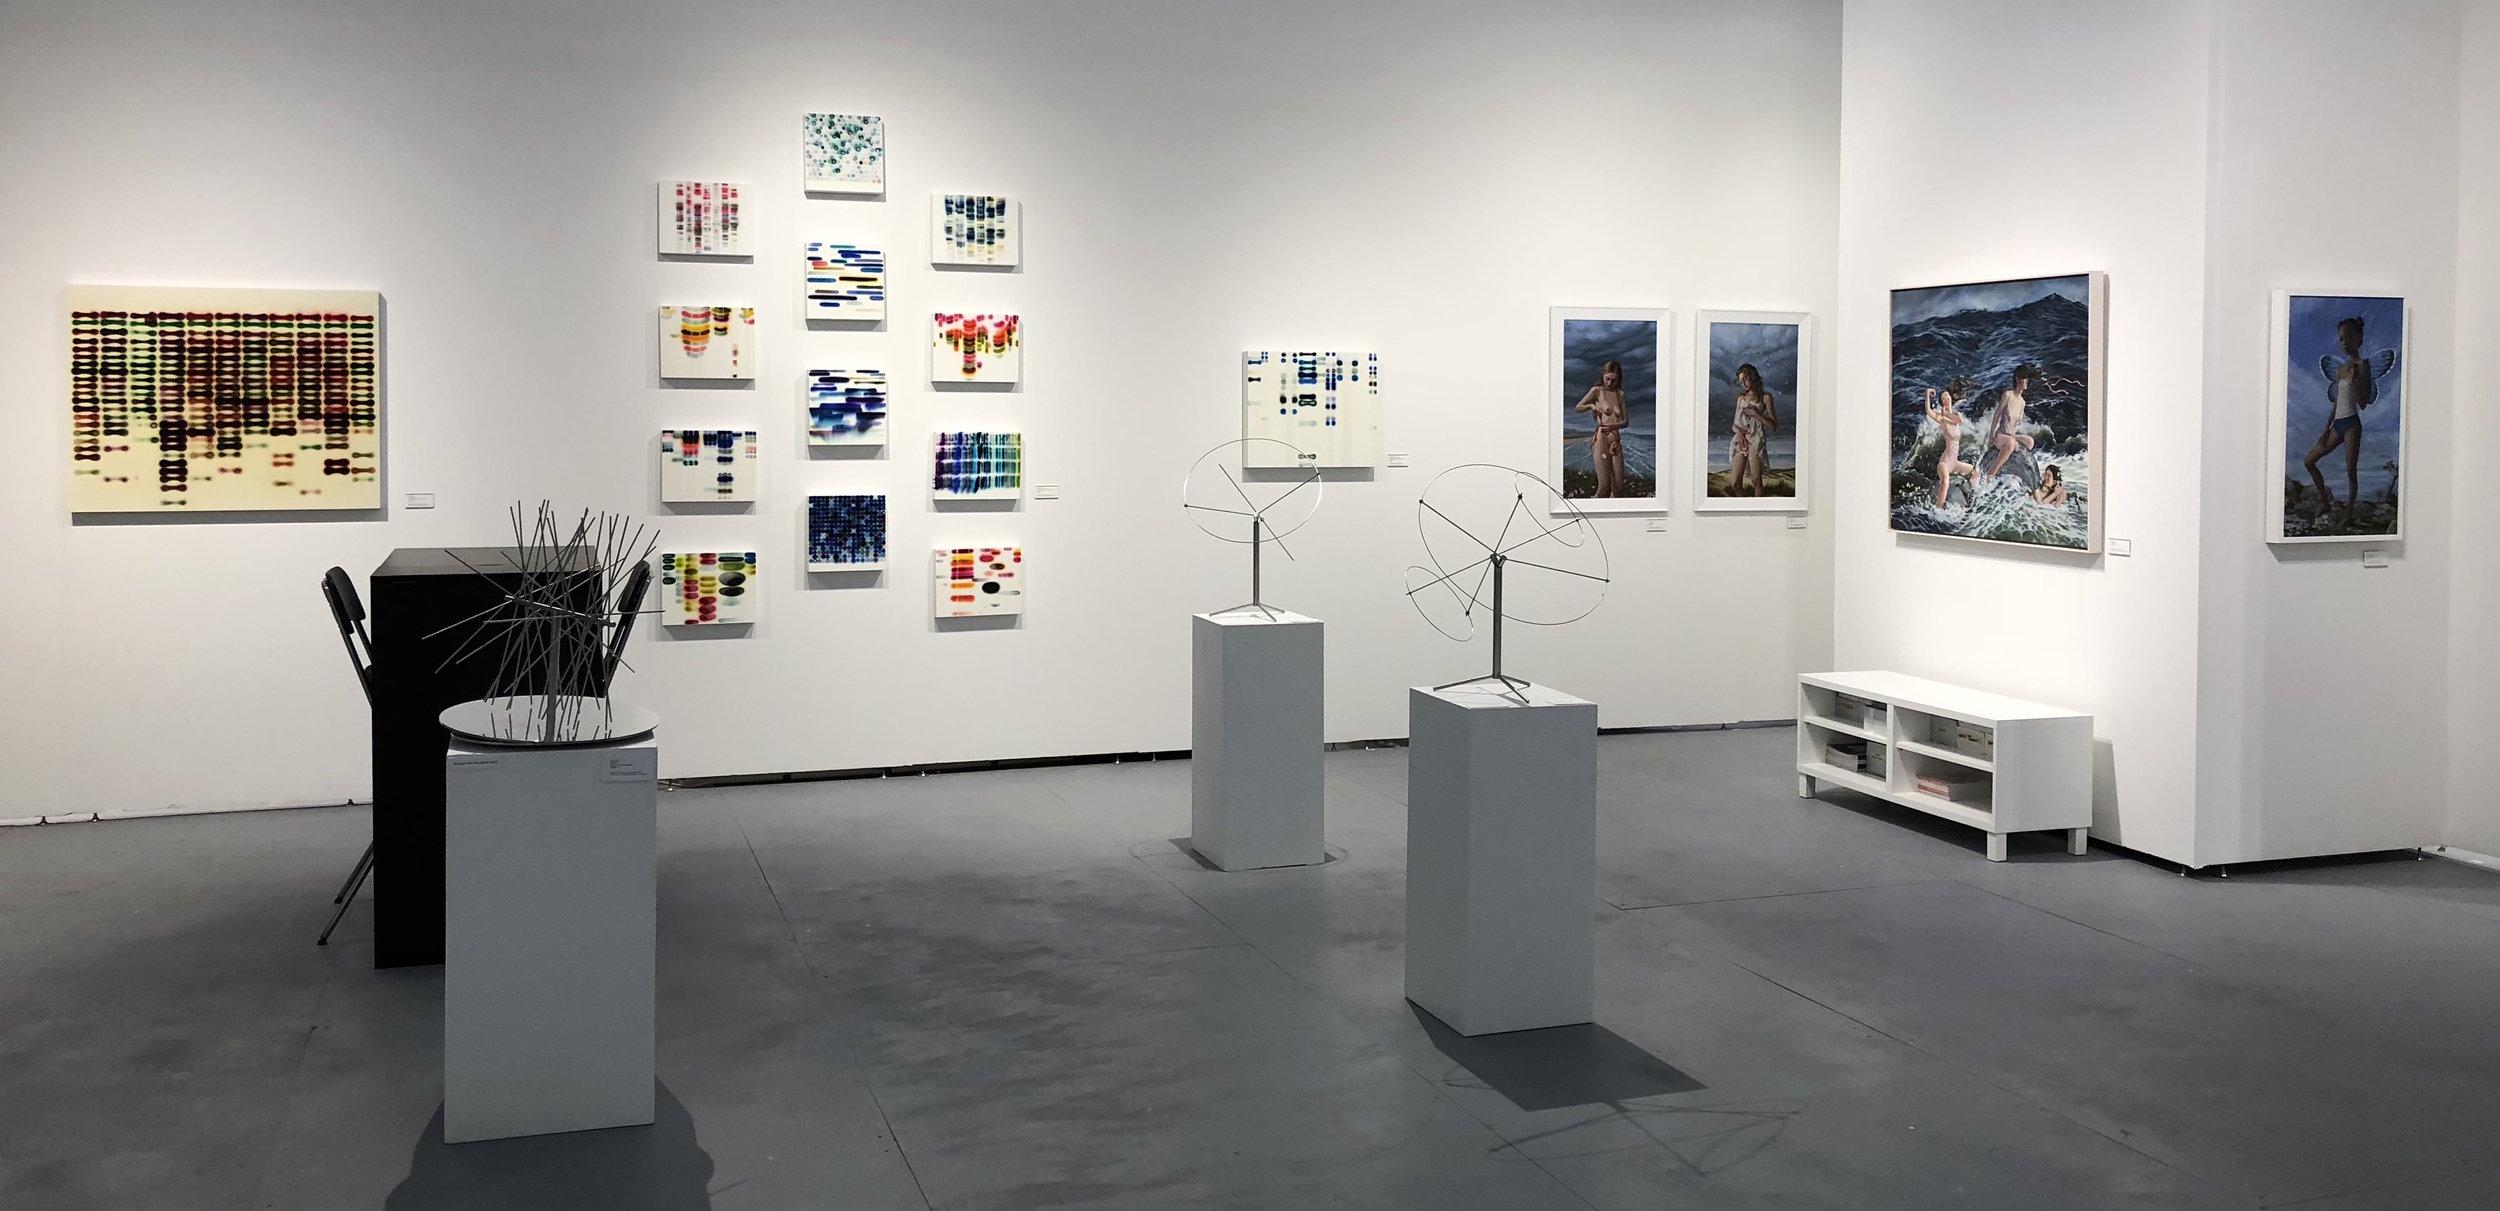 Booth installation at PULSE Art Fair (2018).